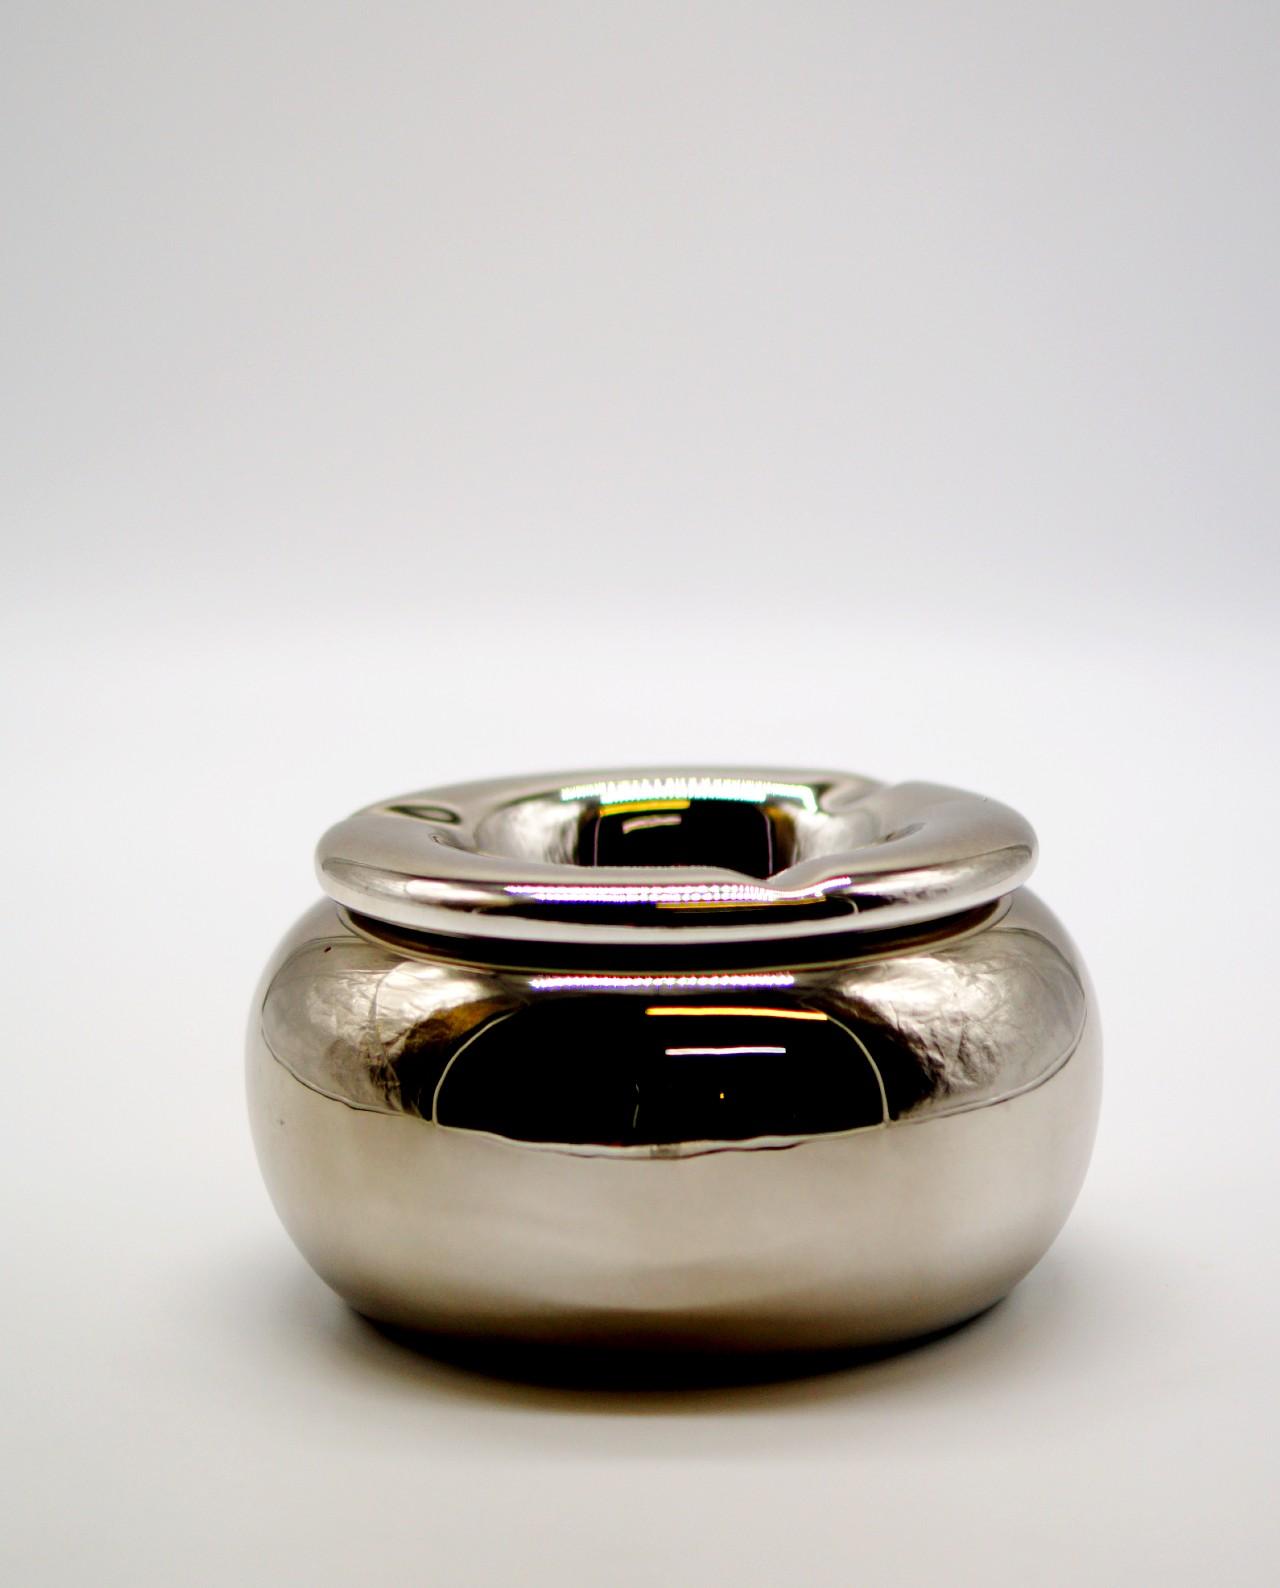 Ashtray Ceramic Silver Diameter 15 cm